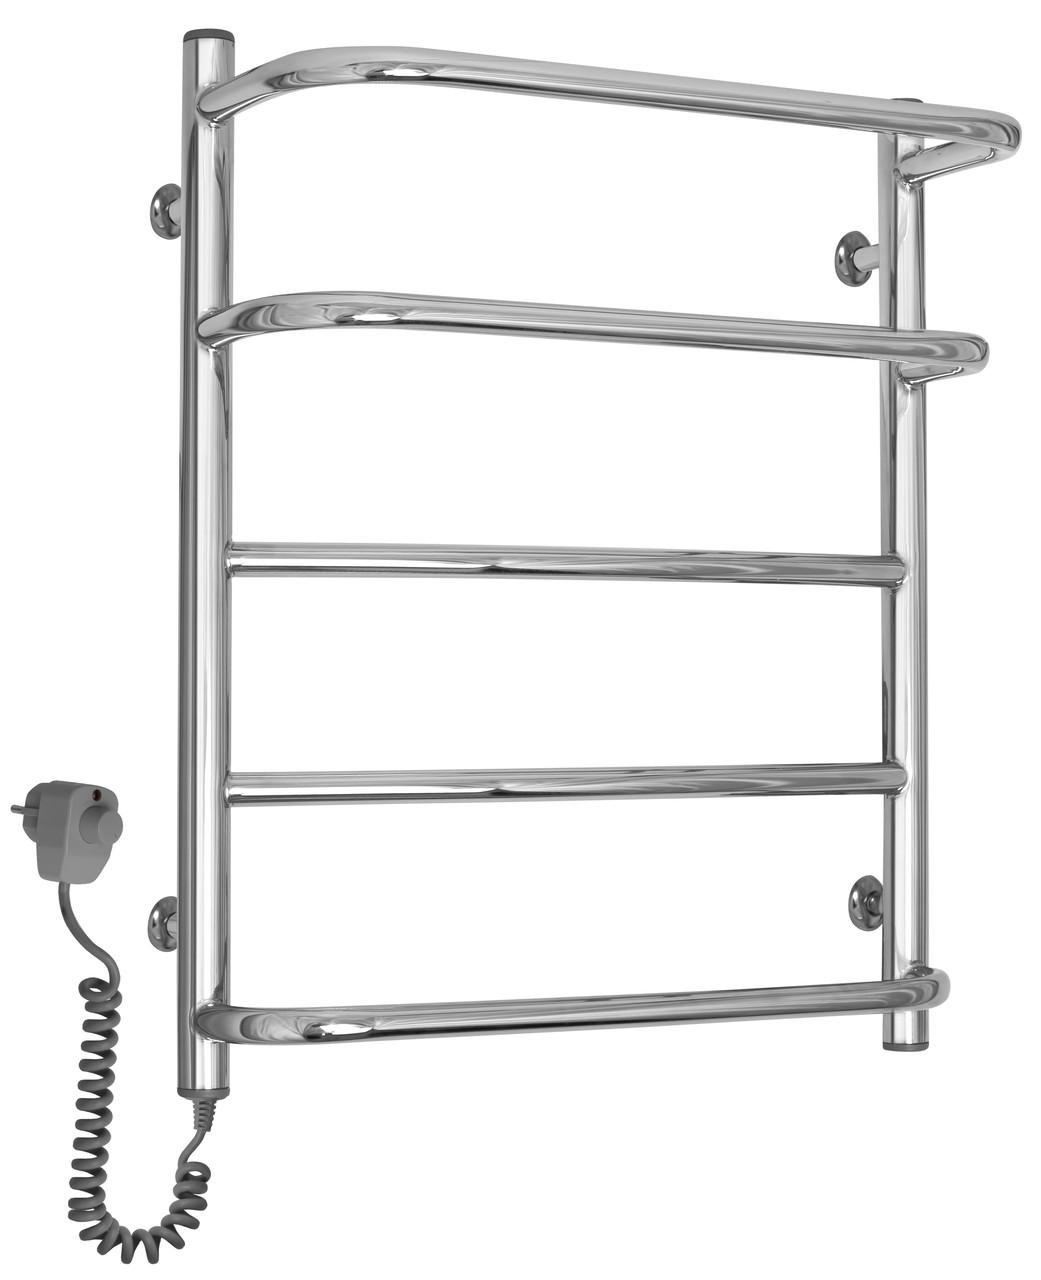 Полотенцесушитель электрический Paladii Триумф Электро 600x500/5 левый без регулятора